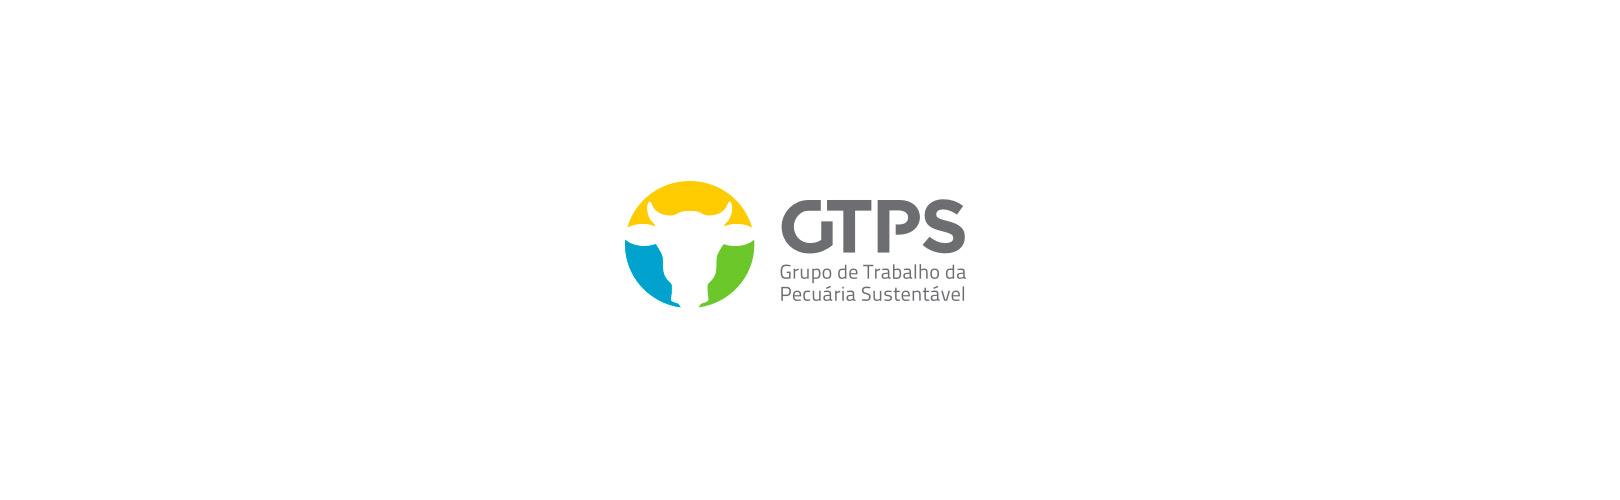 gtps-logo